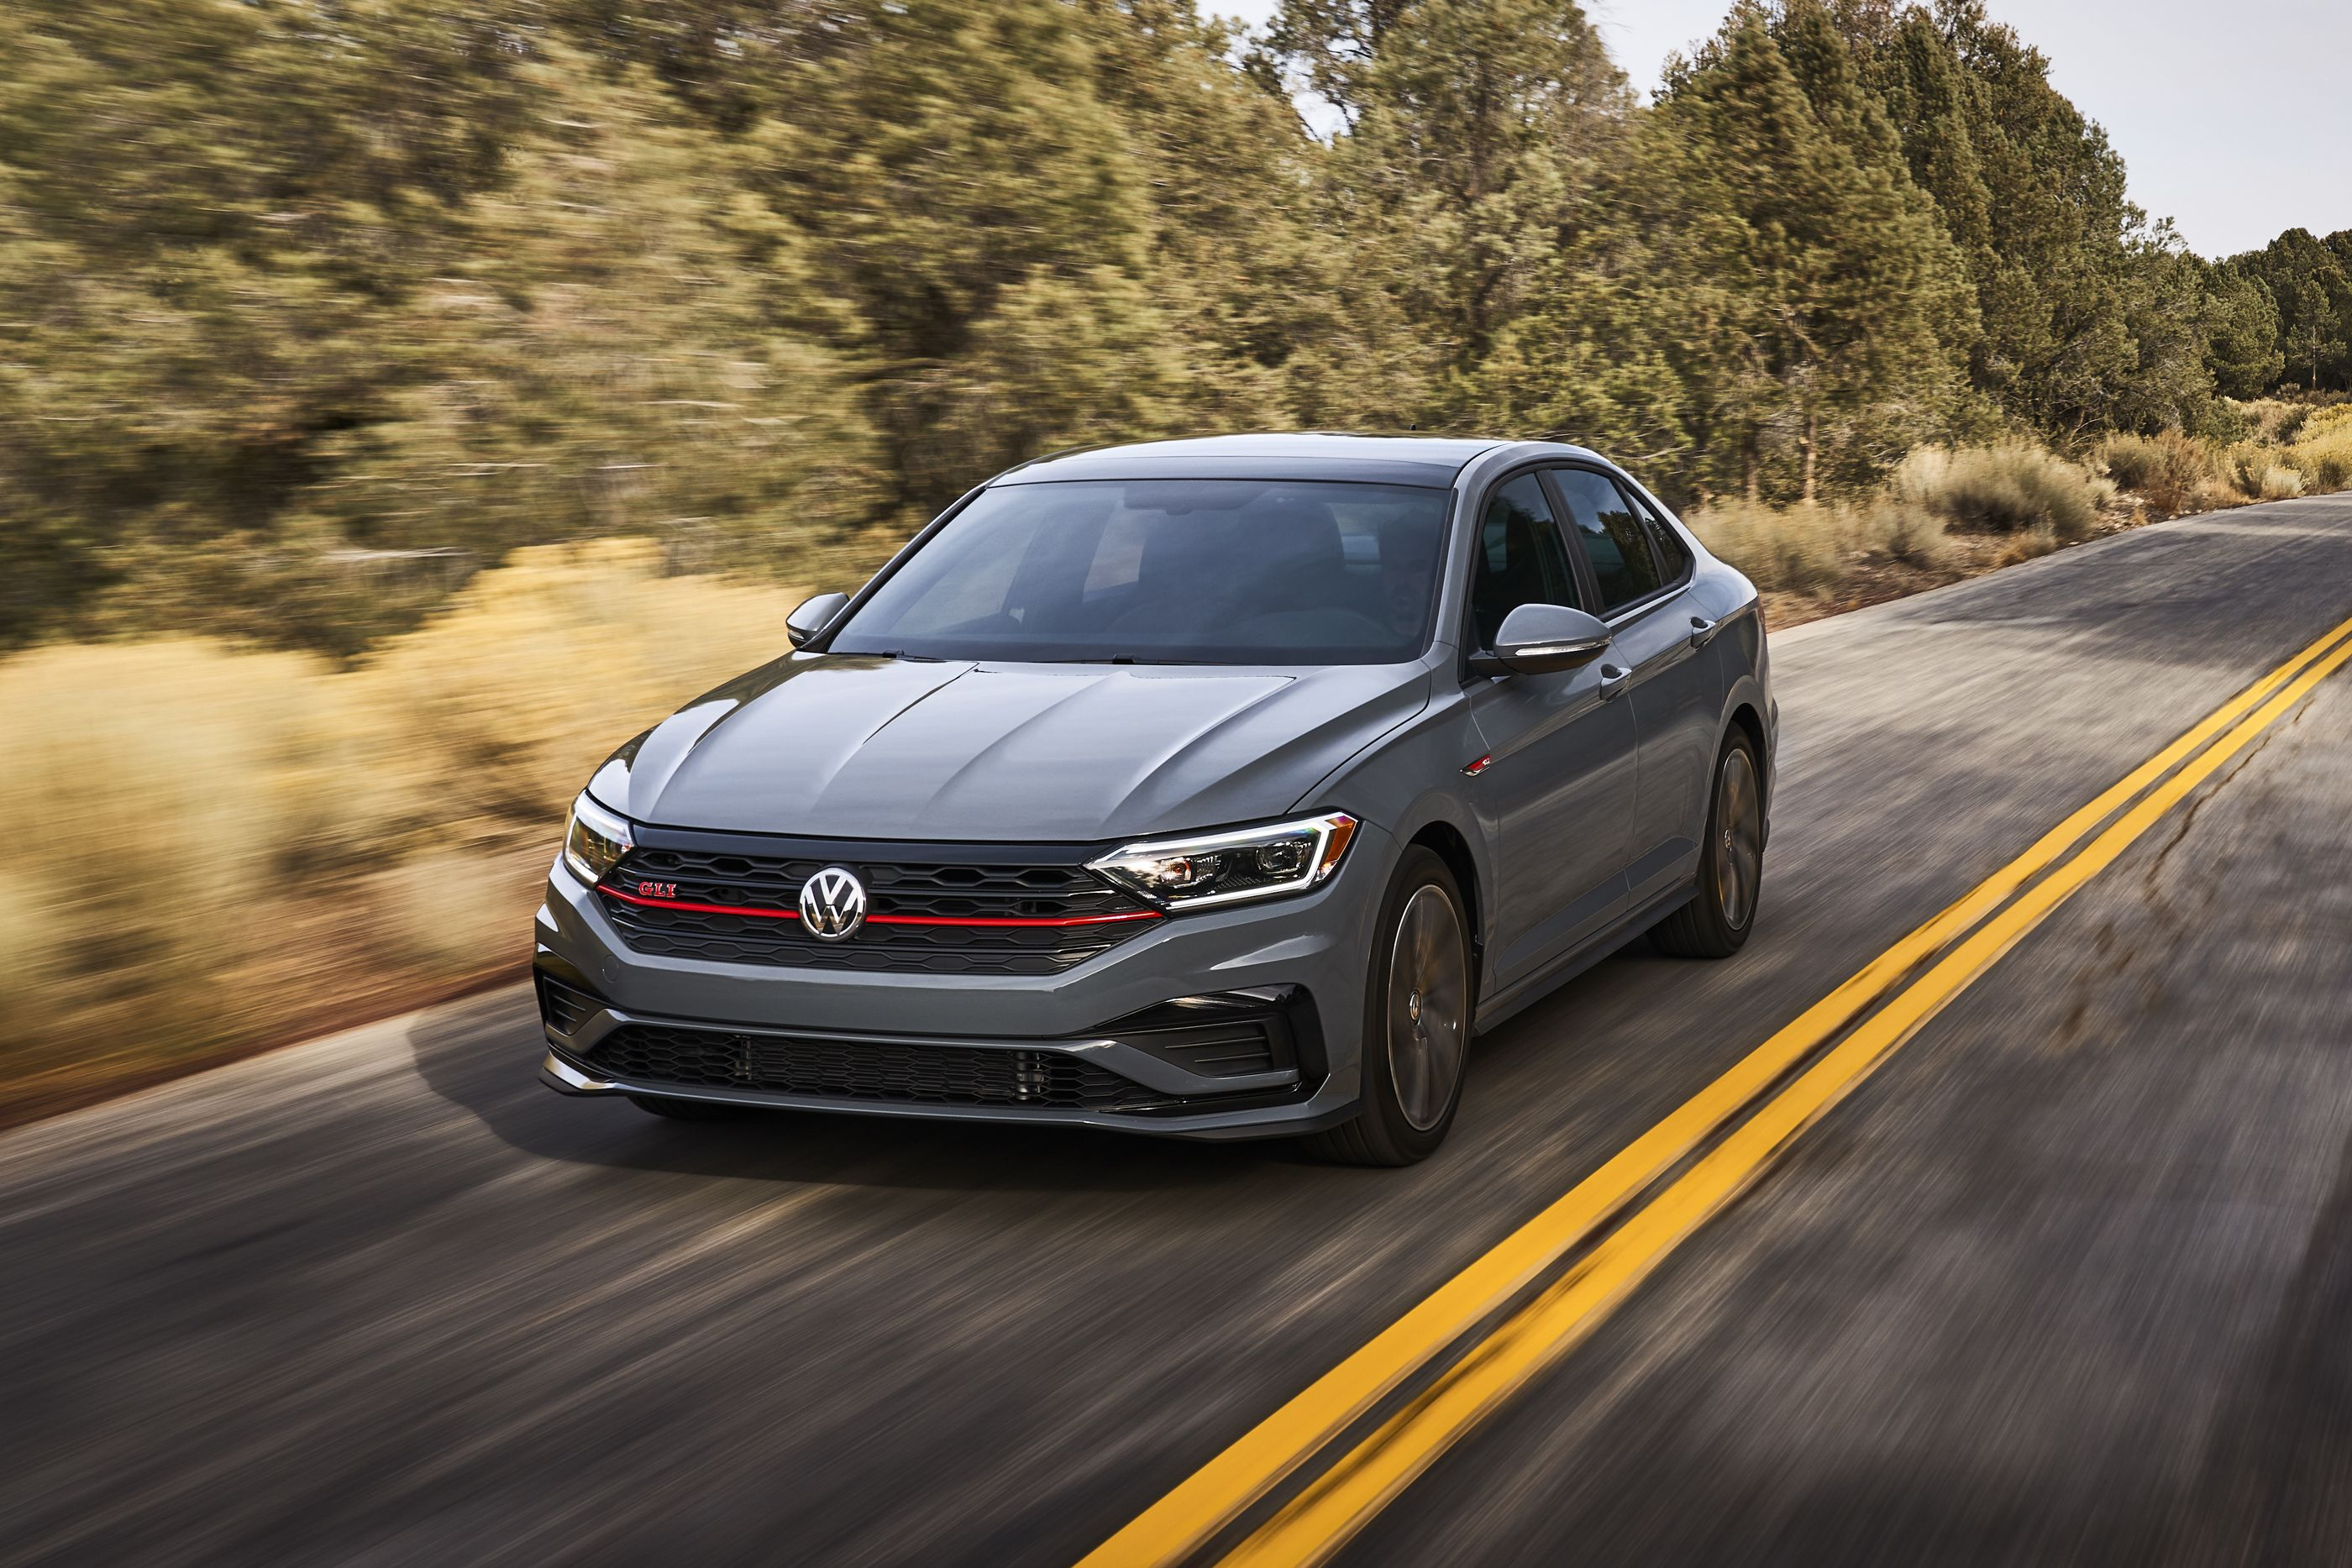 4 Volkswagen Jetta GLI Review, Pricing, and Specs